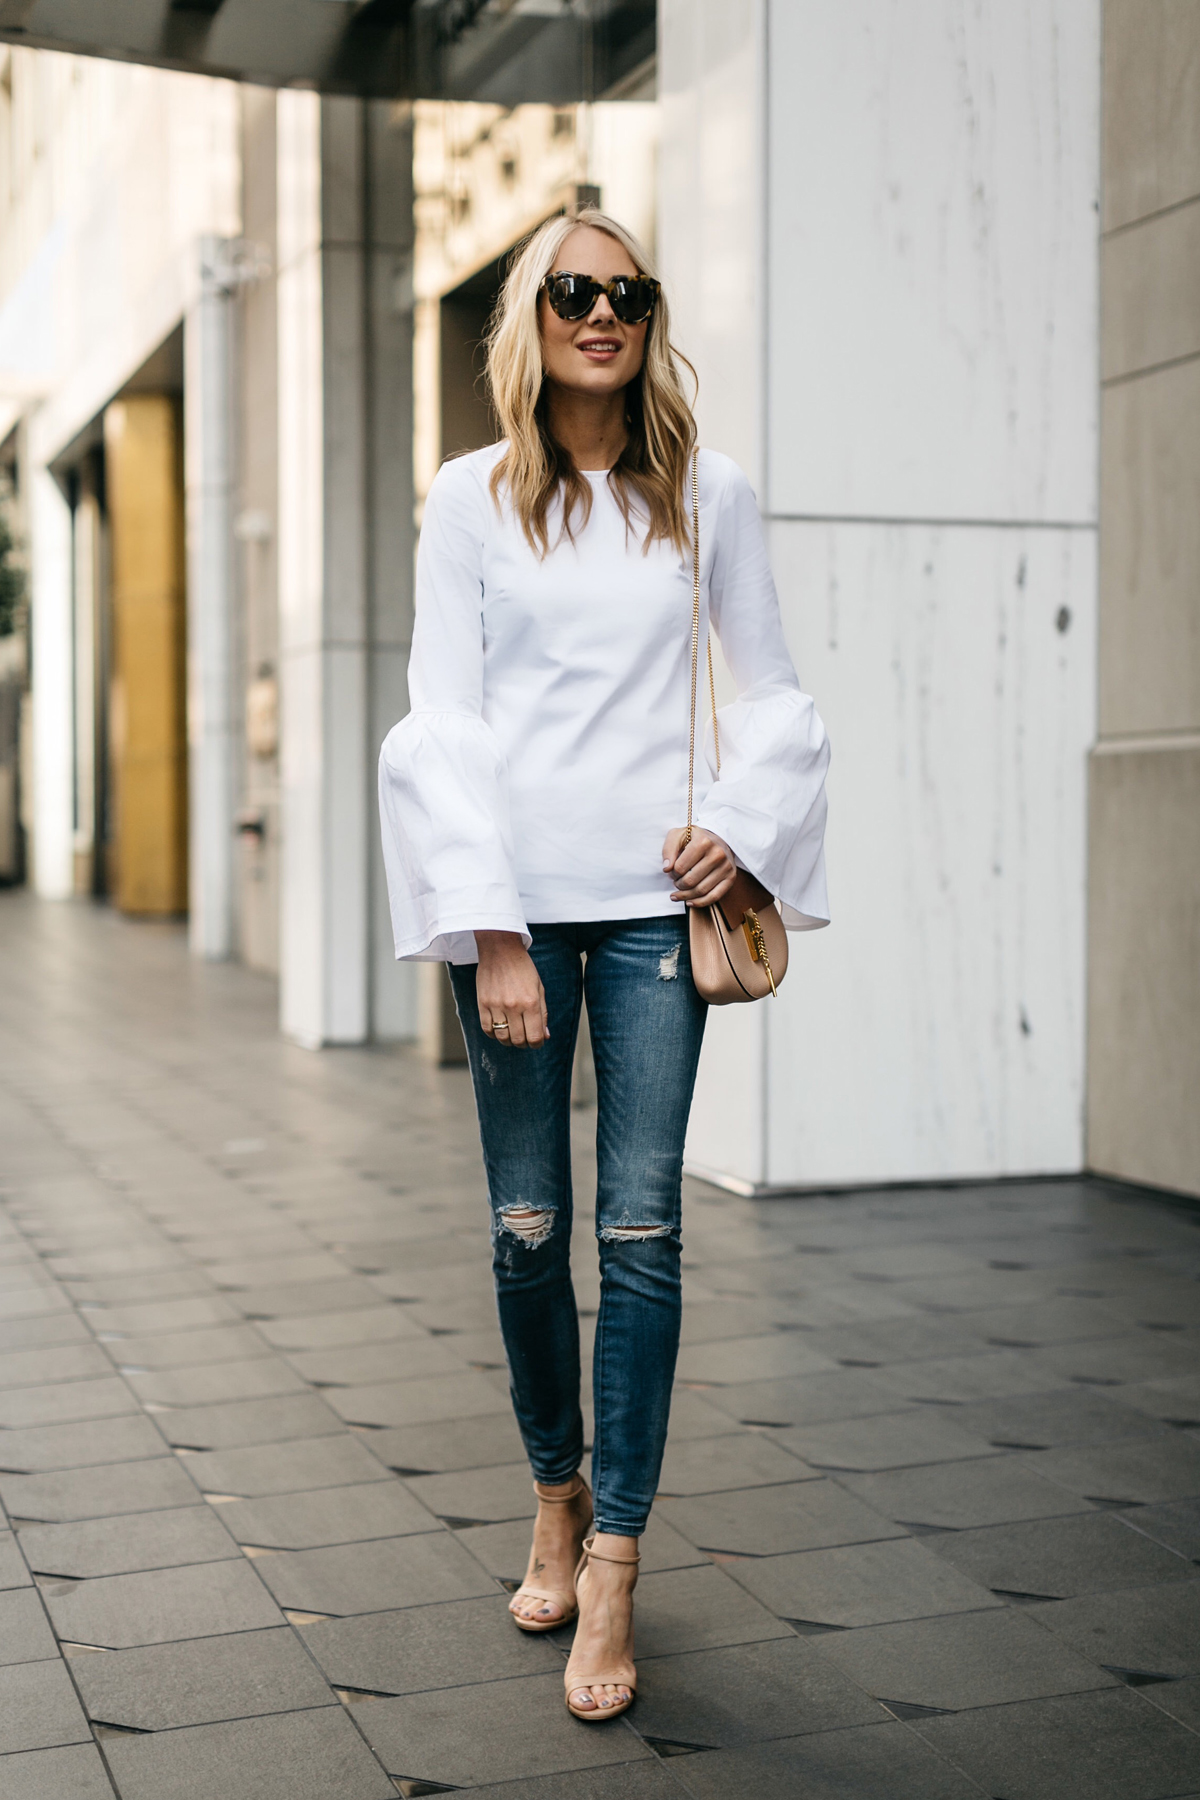 Fashion Jackson, Street Style, MLM Label Rhodes Top White, Blanknyc Denim Ripped Skinny Jeans, Chloe Drew Handbag, Steve Madden Stecy Heels Nude